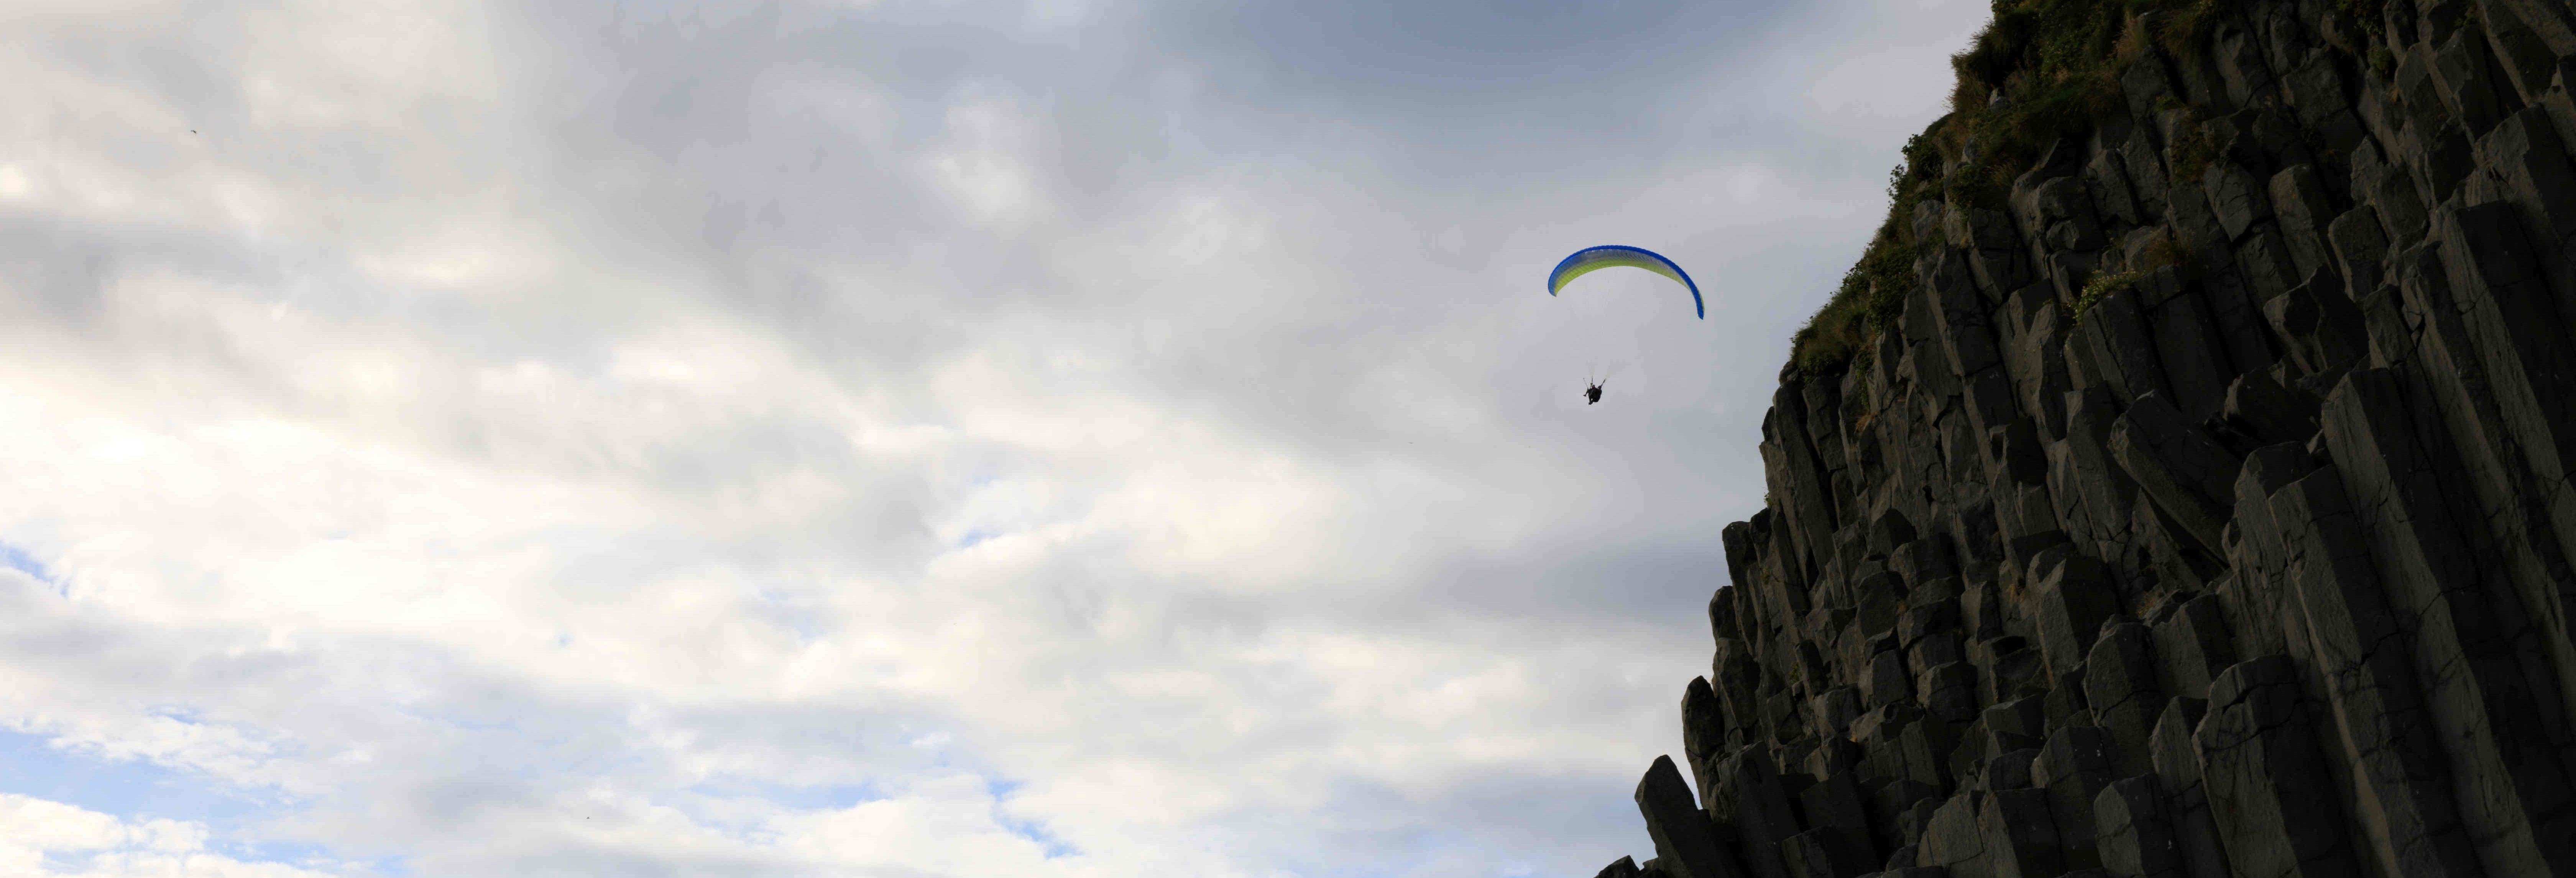 Paragliding in Vik